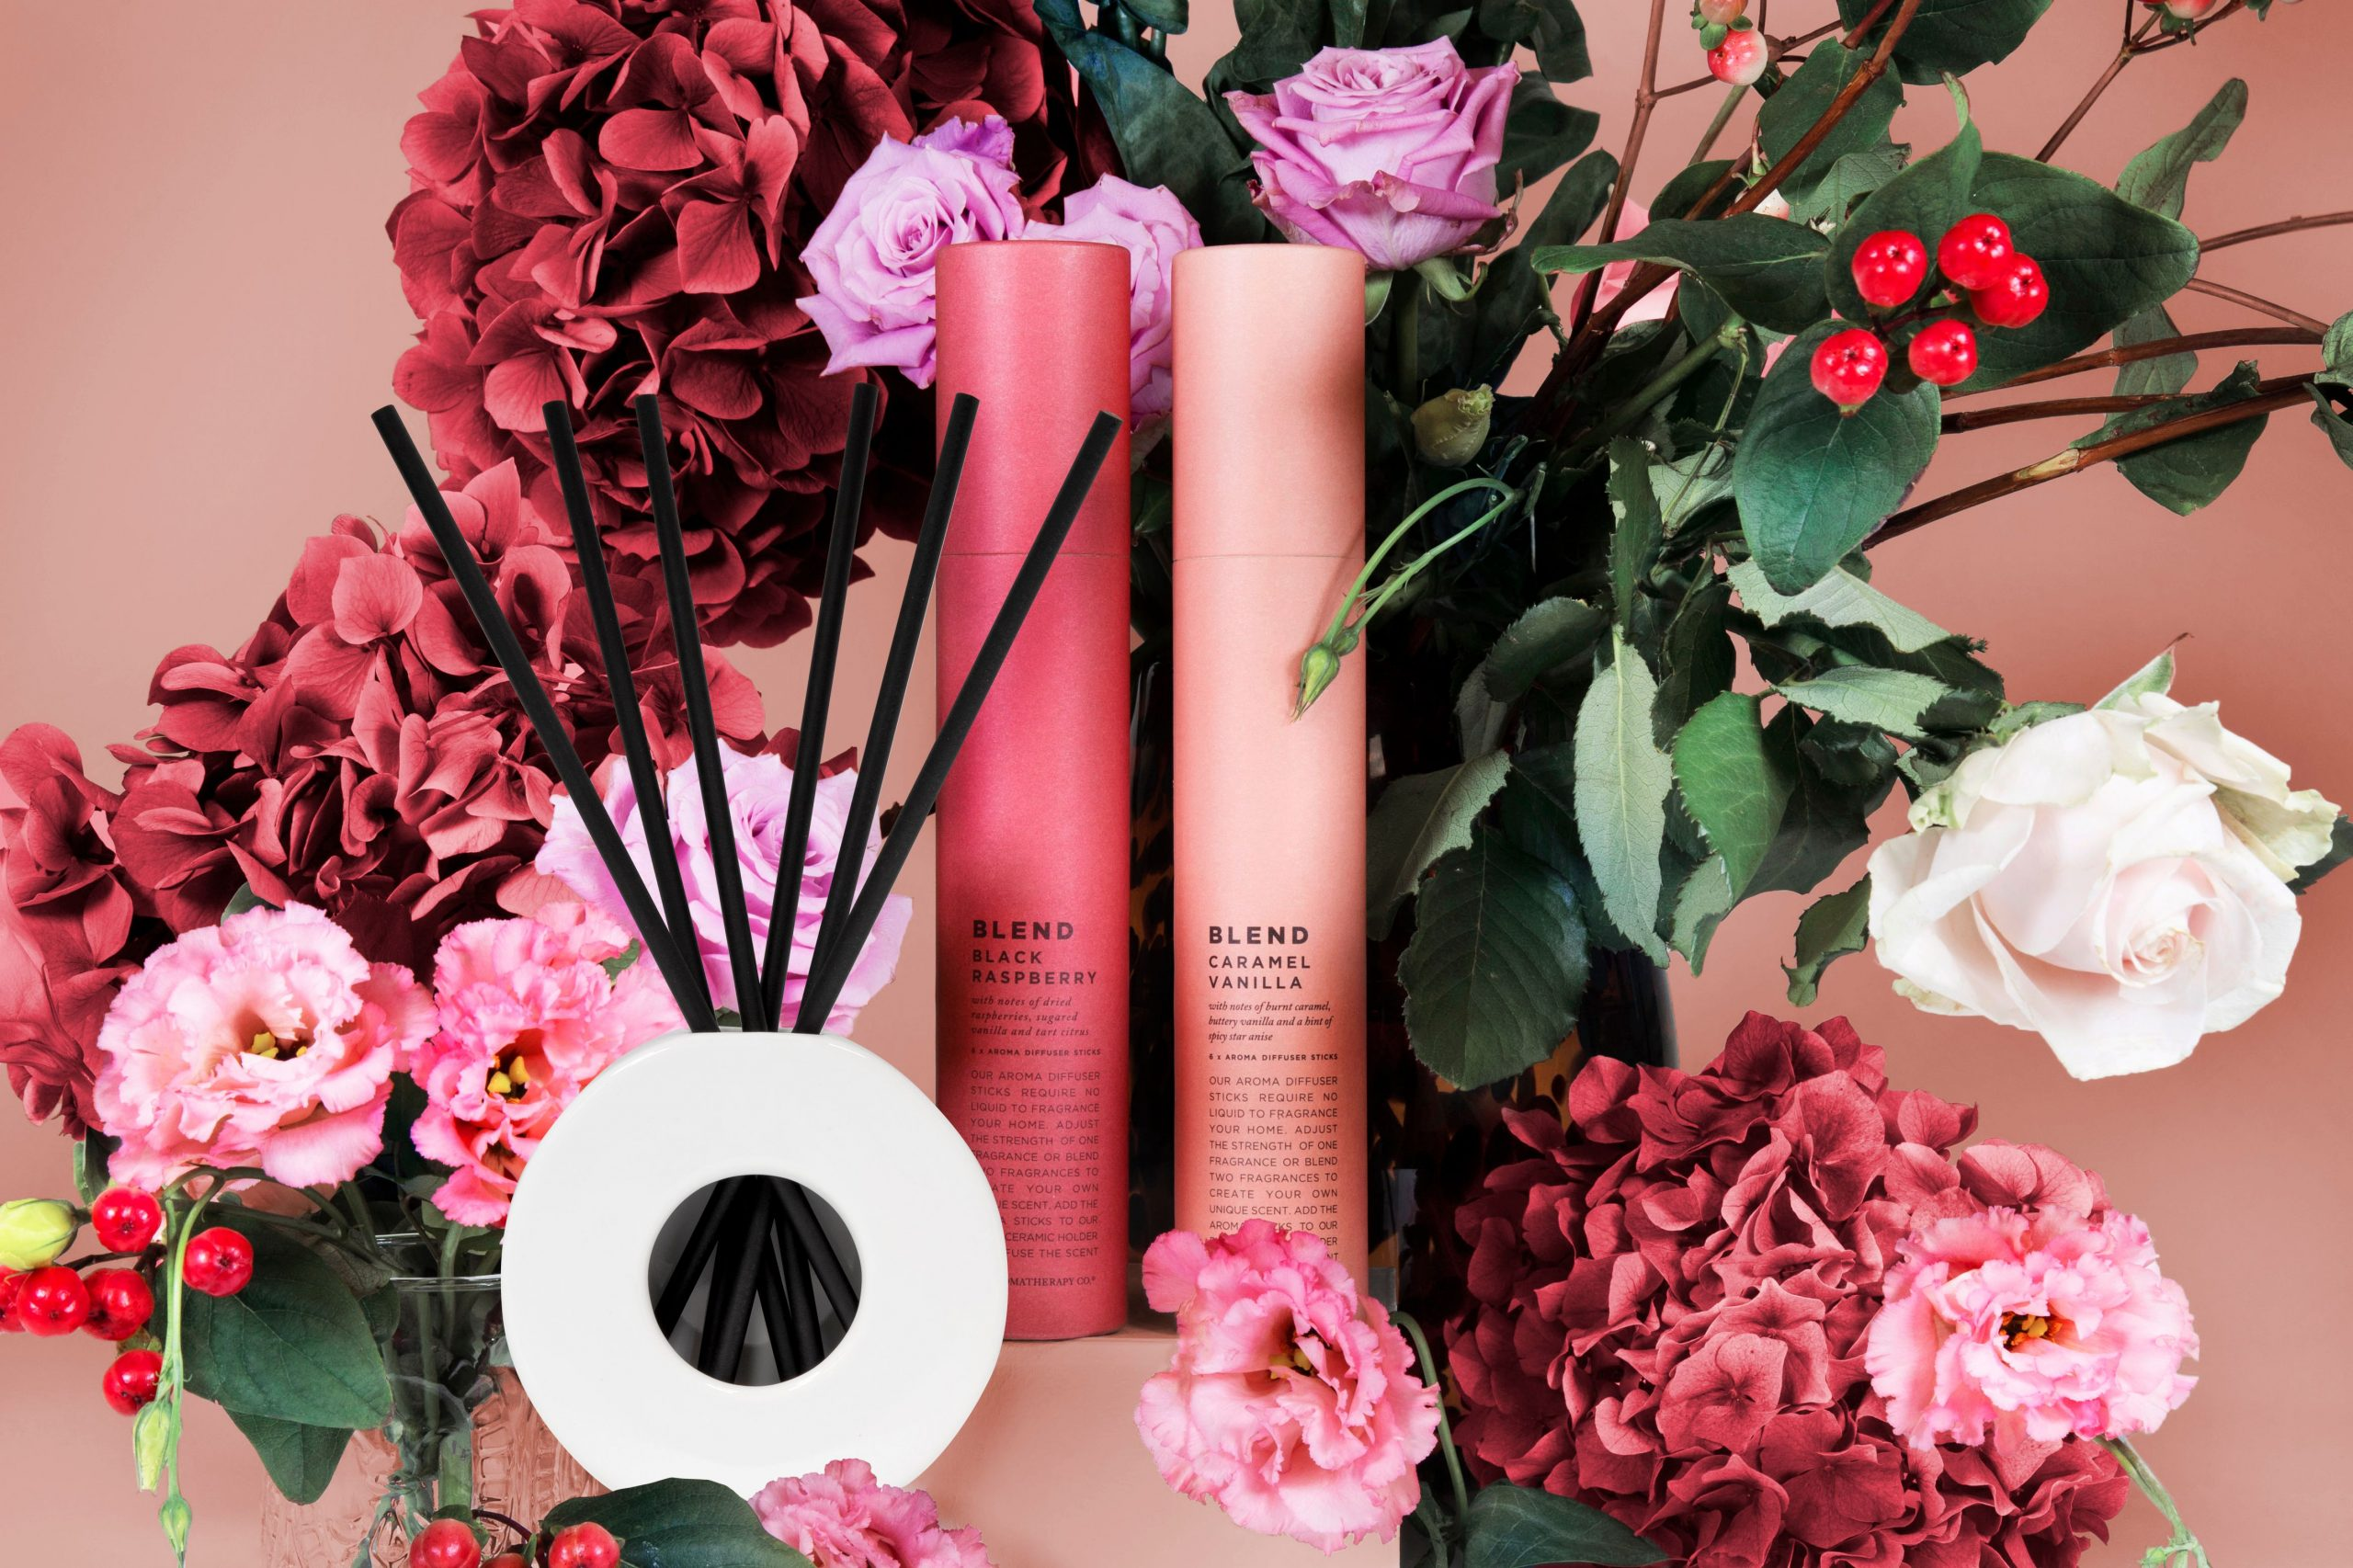 Blend Aroma Diffuser Sticks Vogue Beauty Clinic